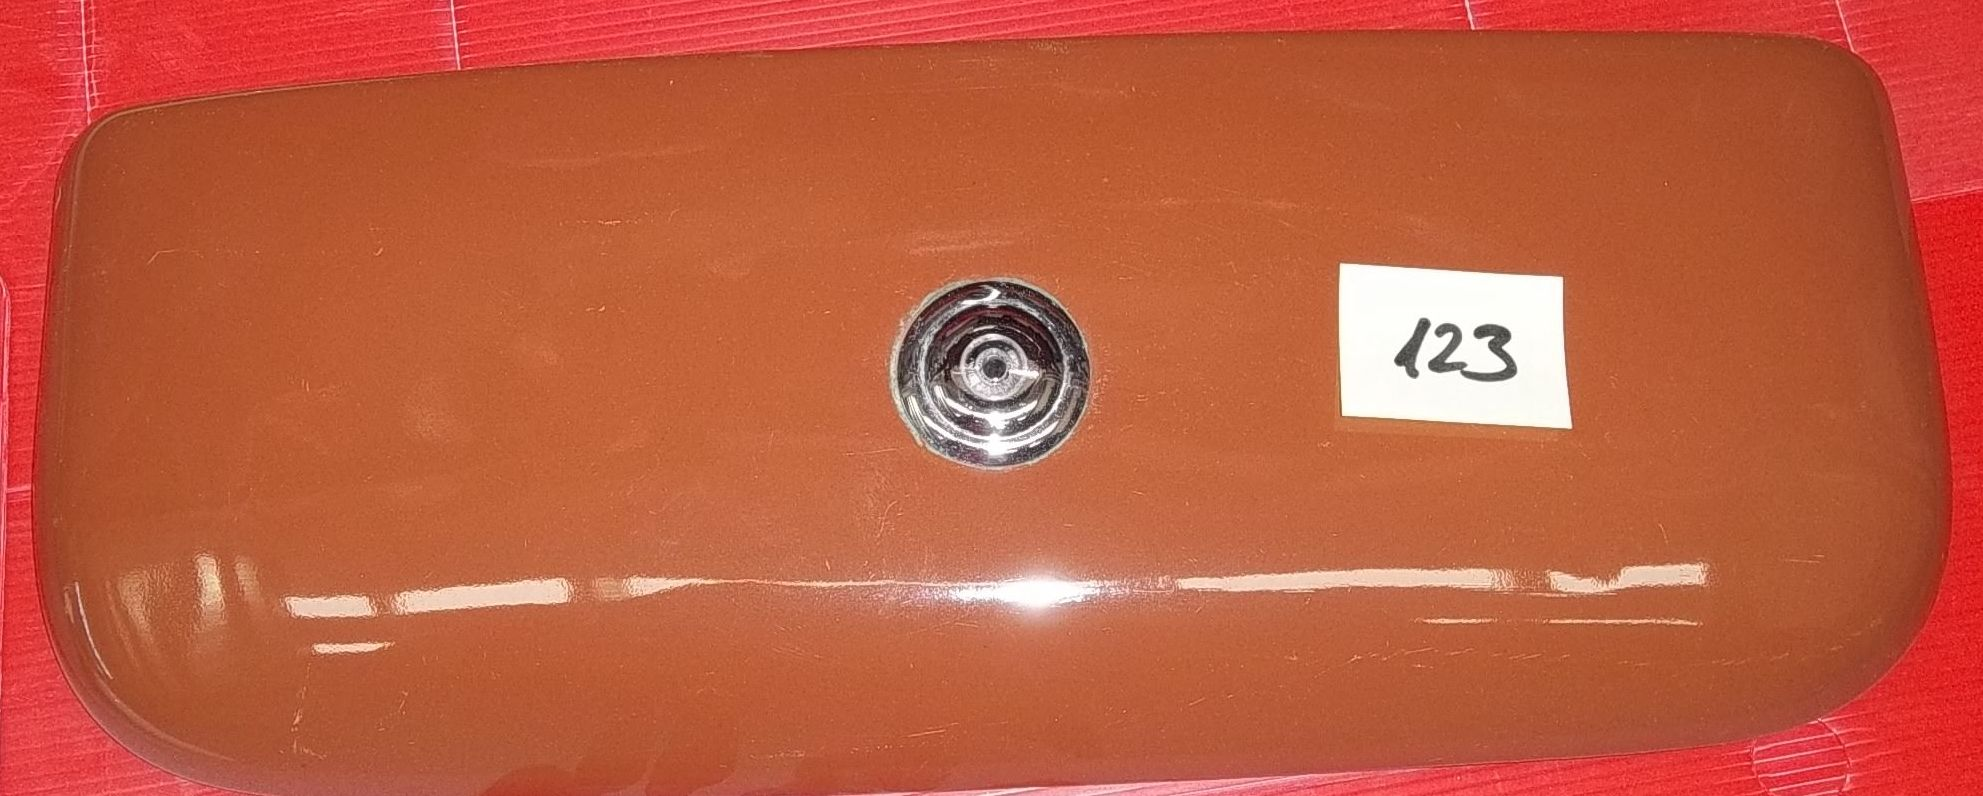 Bellavista Capri Chocolate: Material en venta de Fontaneros del Henares, S.L.